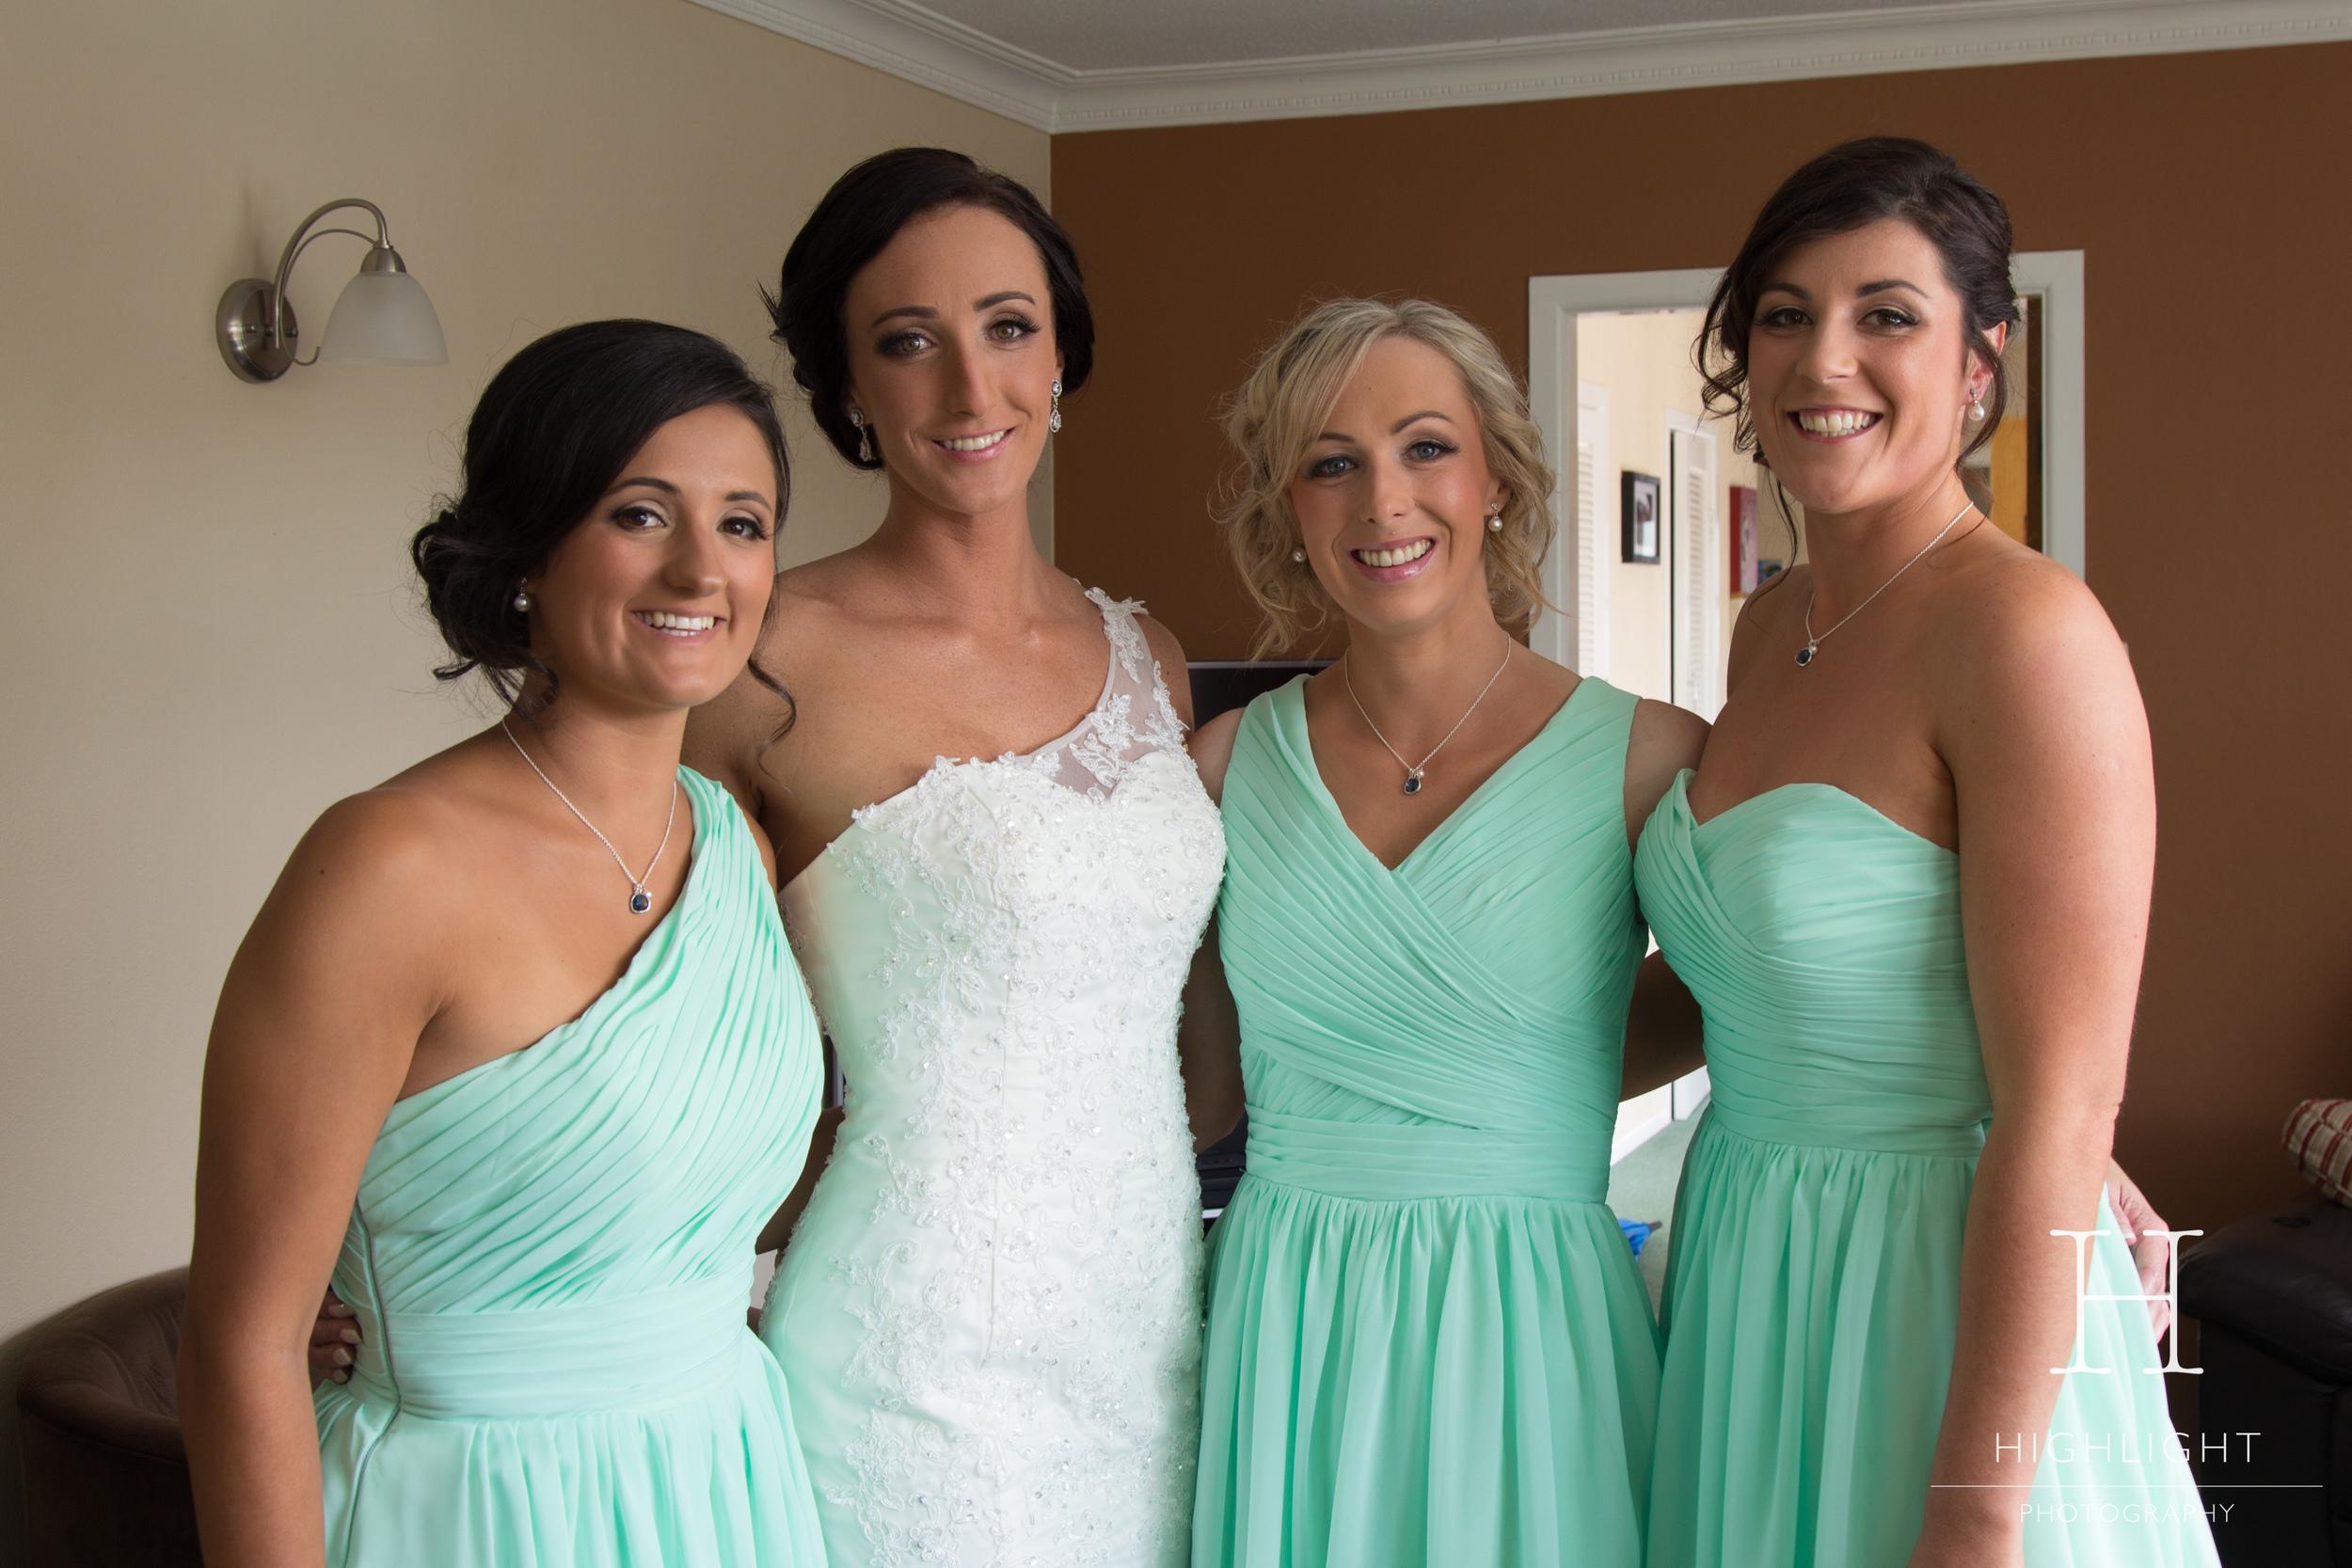 highlight_photography_wedding_new_zealand_kristibridesmaids.jpg